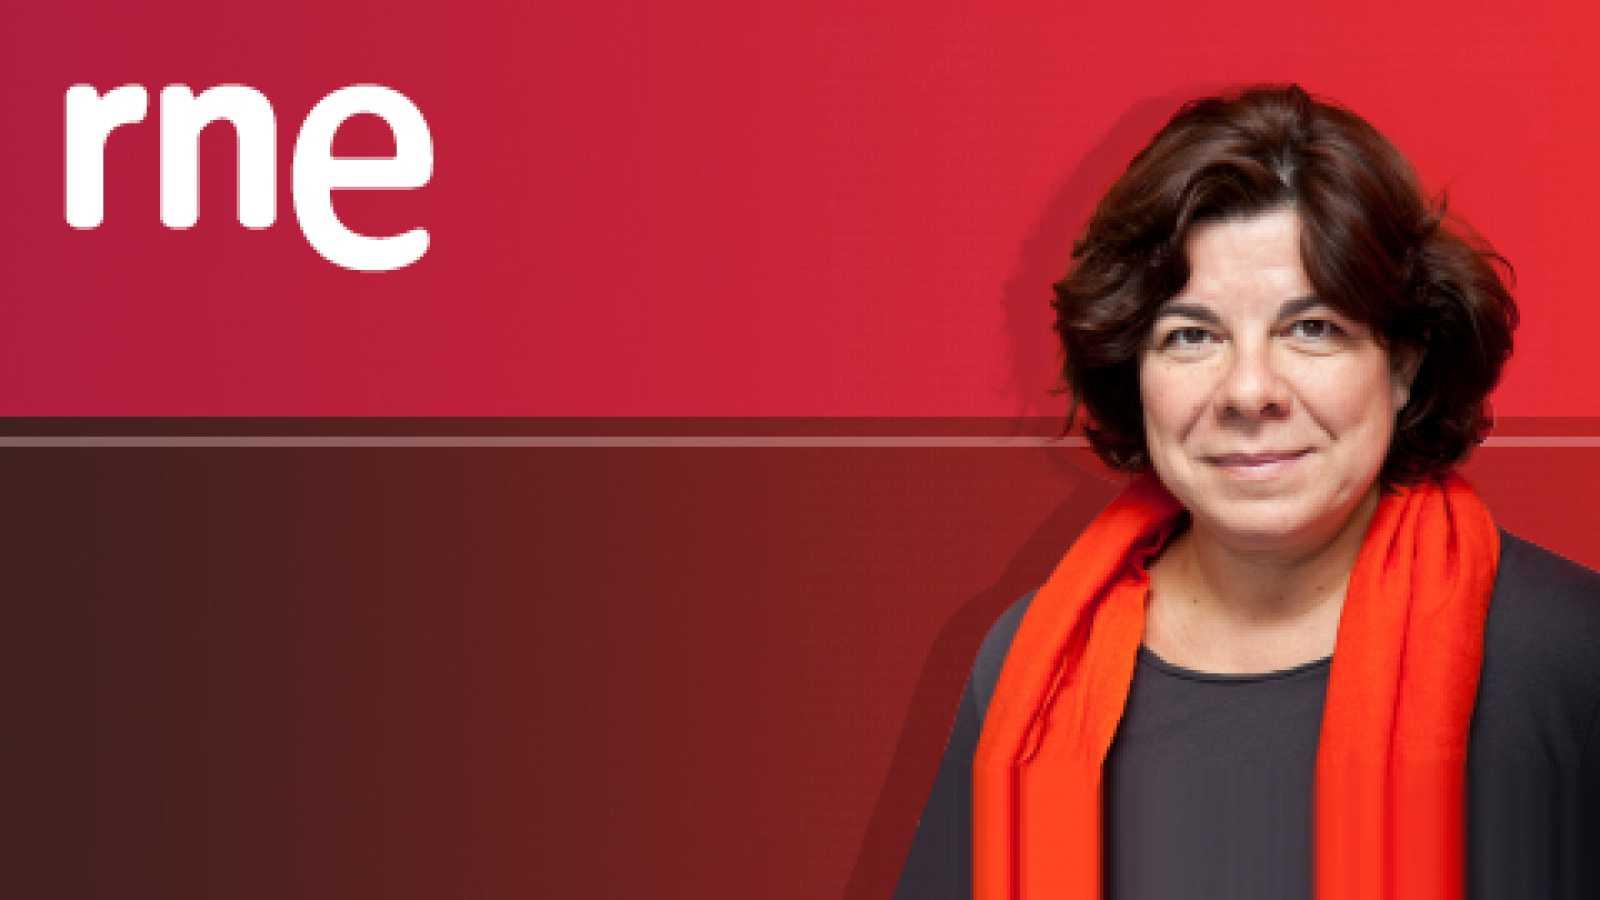 Siluetas - María Frisa - 25/05/14 - escuchar ahora